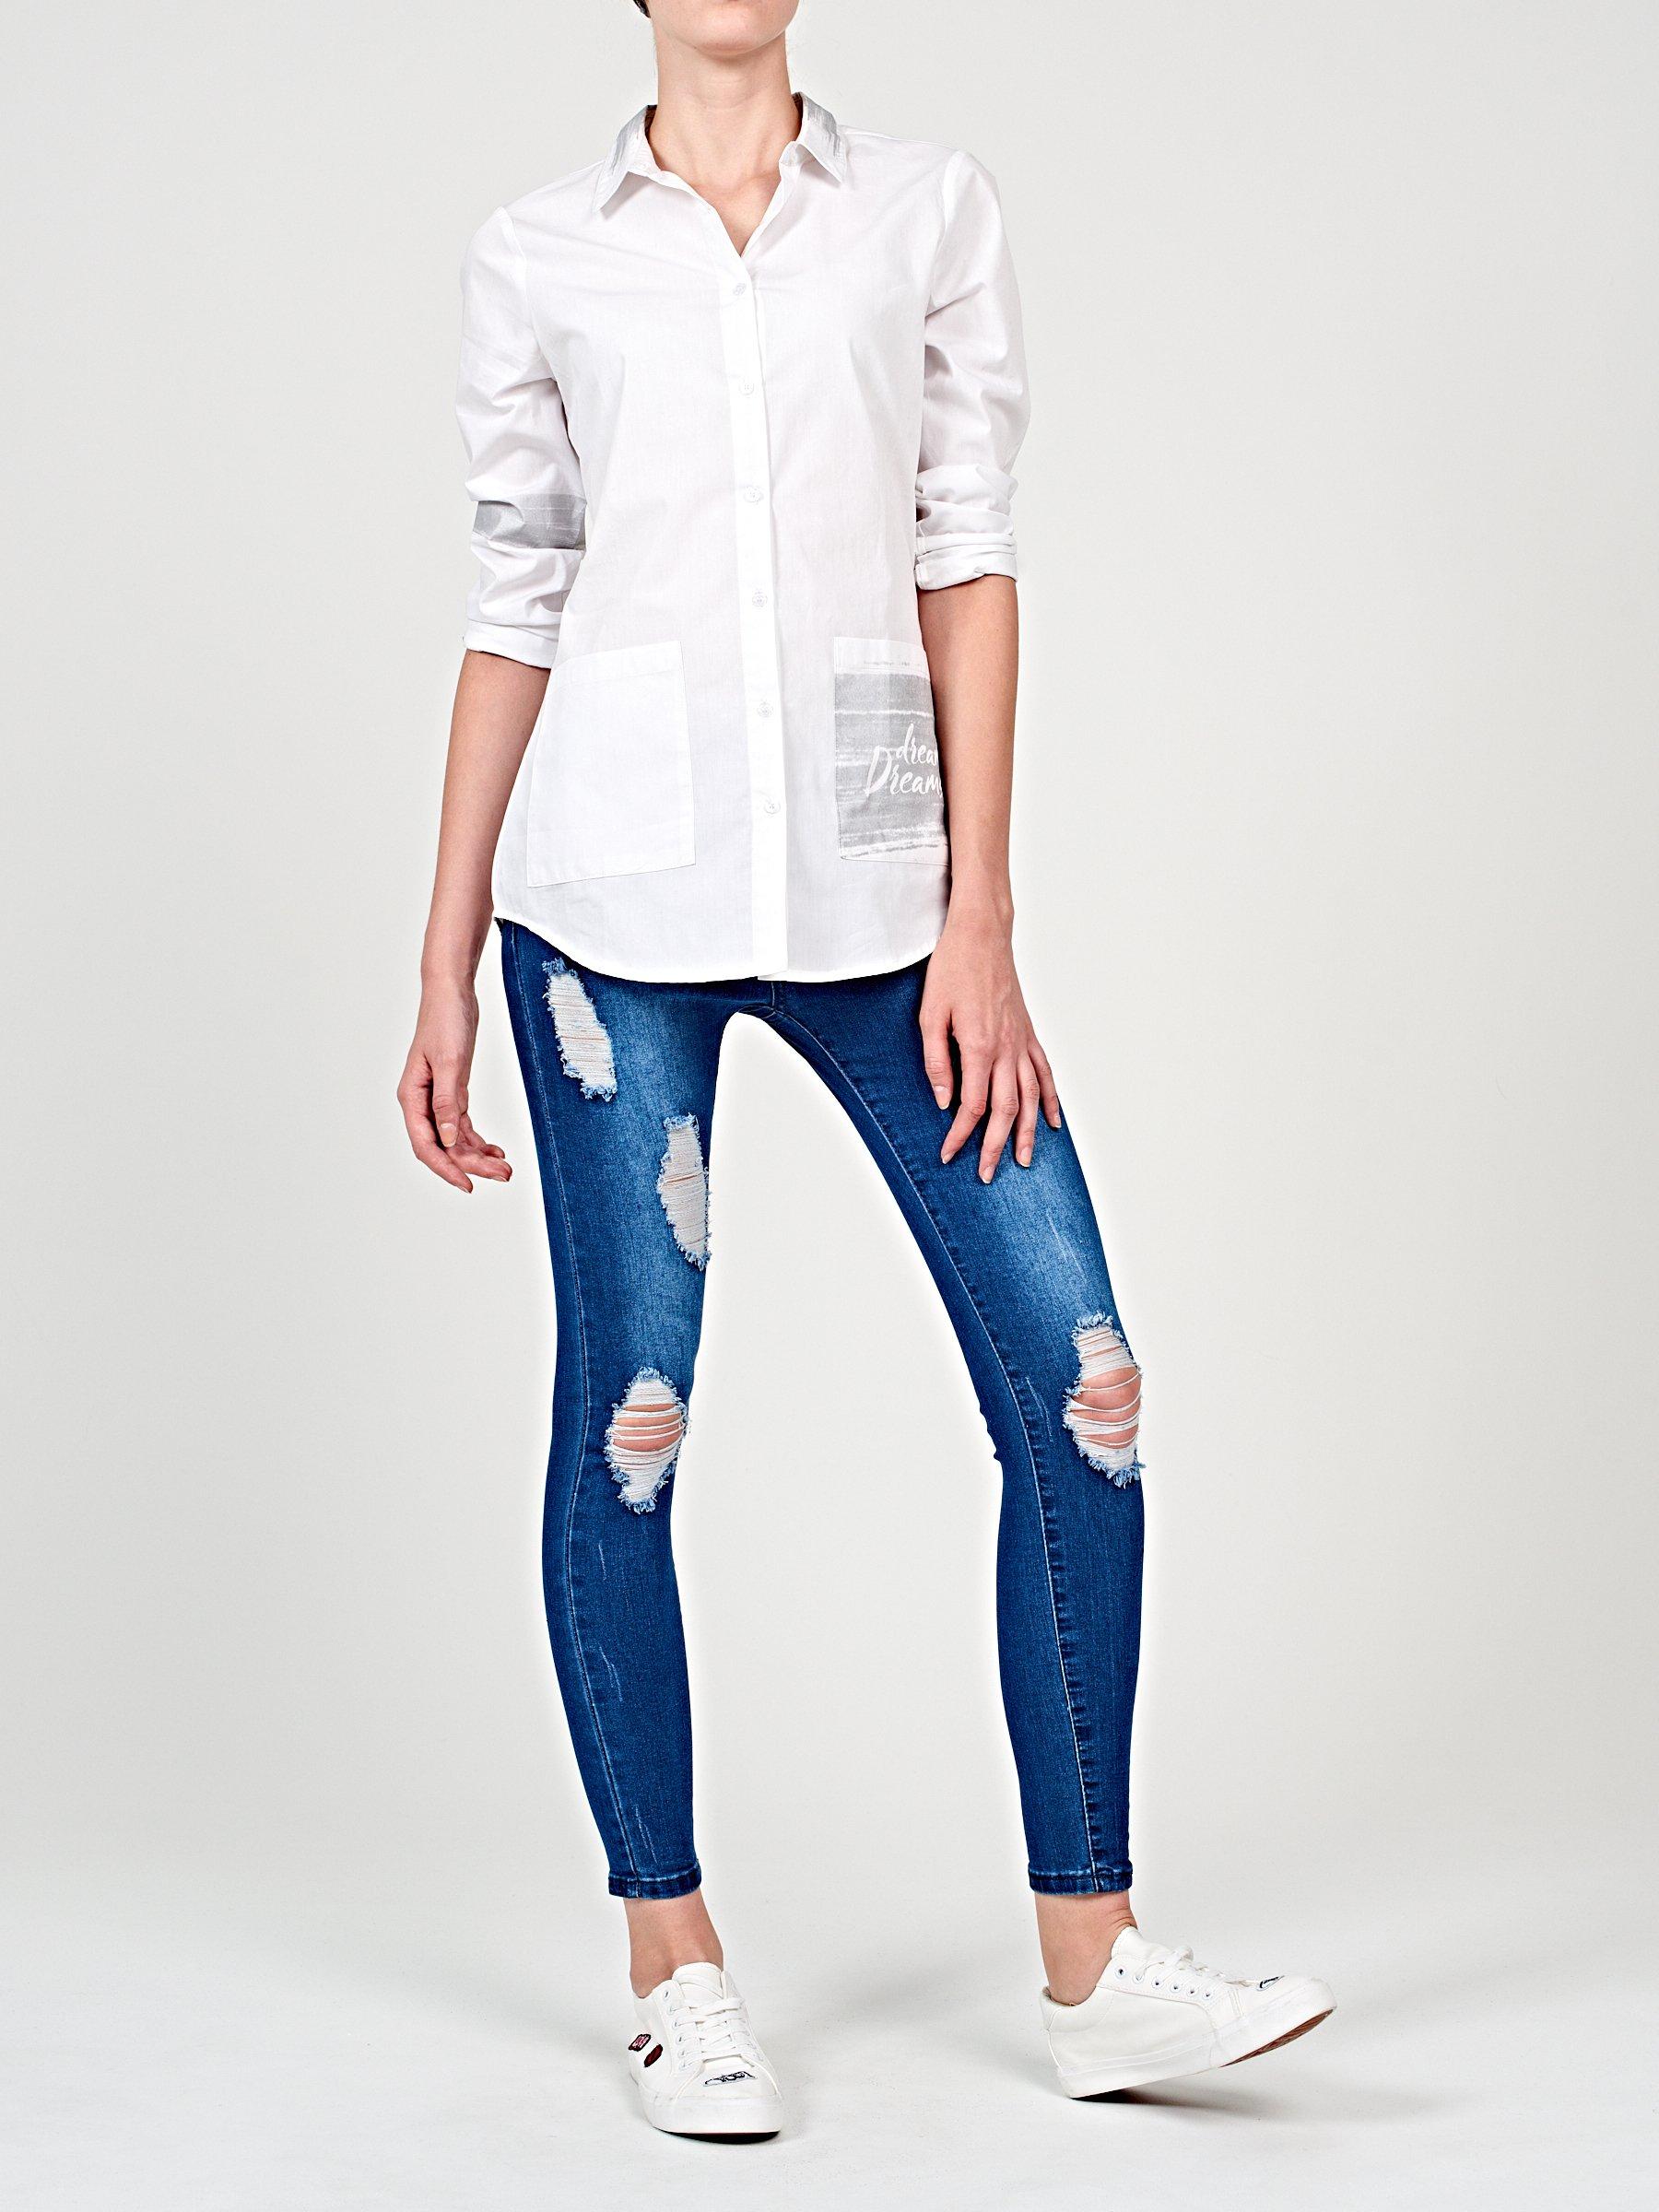 Prolonged Cotton Shirt With Metallic Print Gate